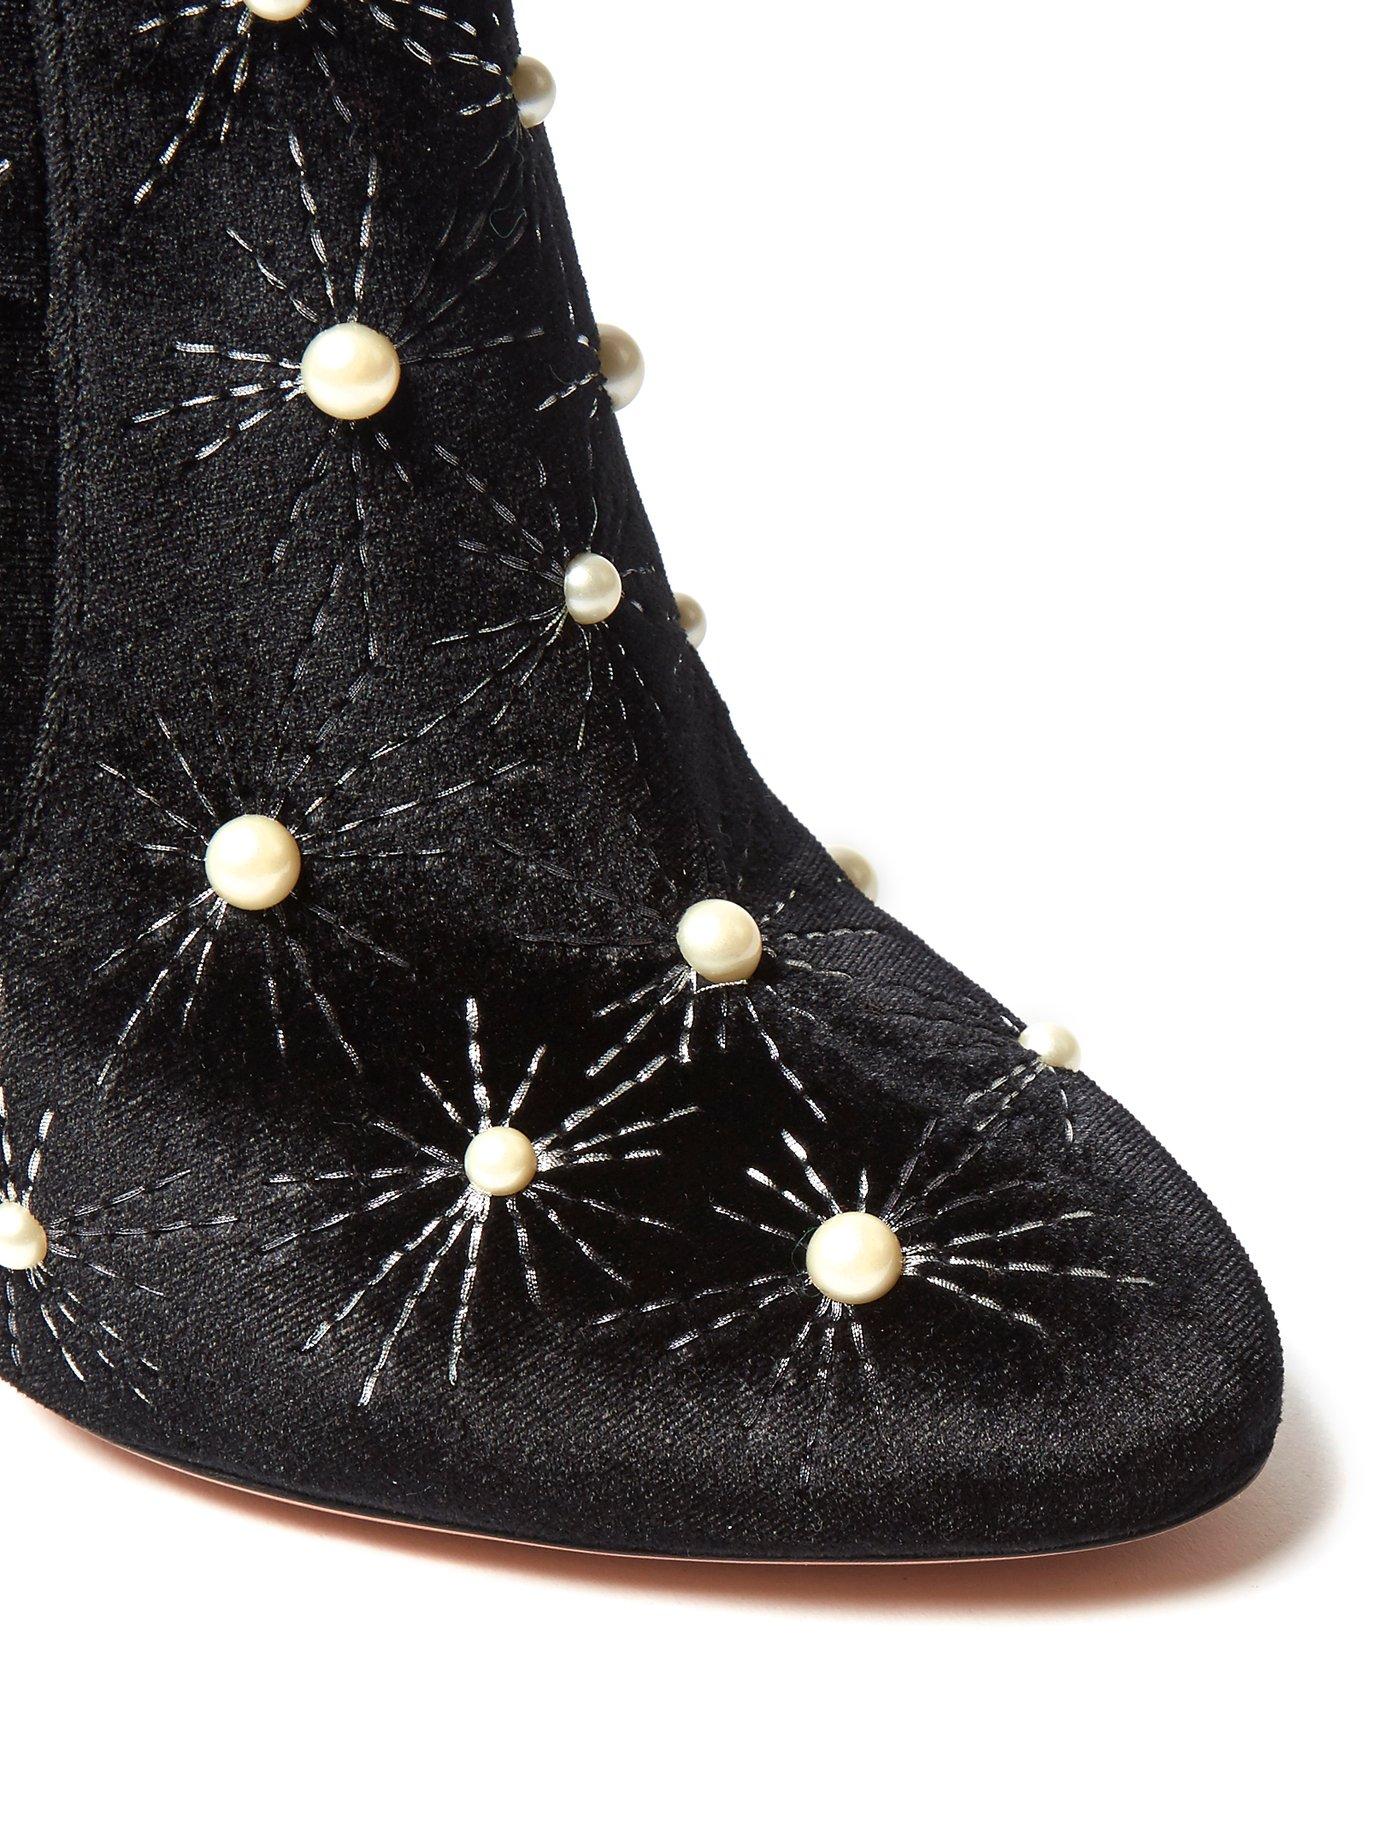 Cosmic Pearls 120 velvet over-the-knee boots by Aquazzura